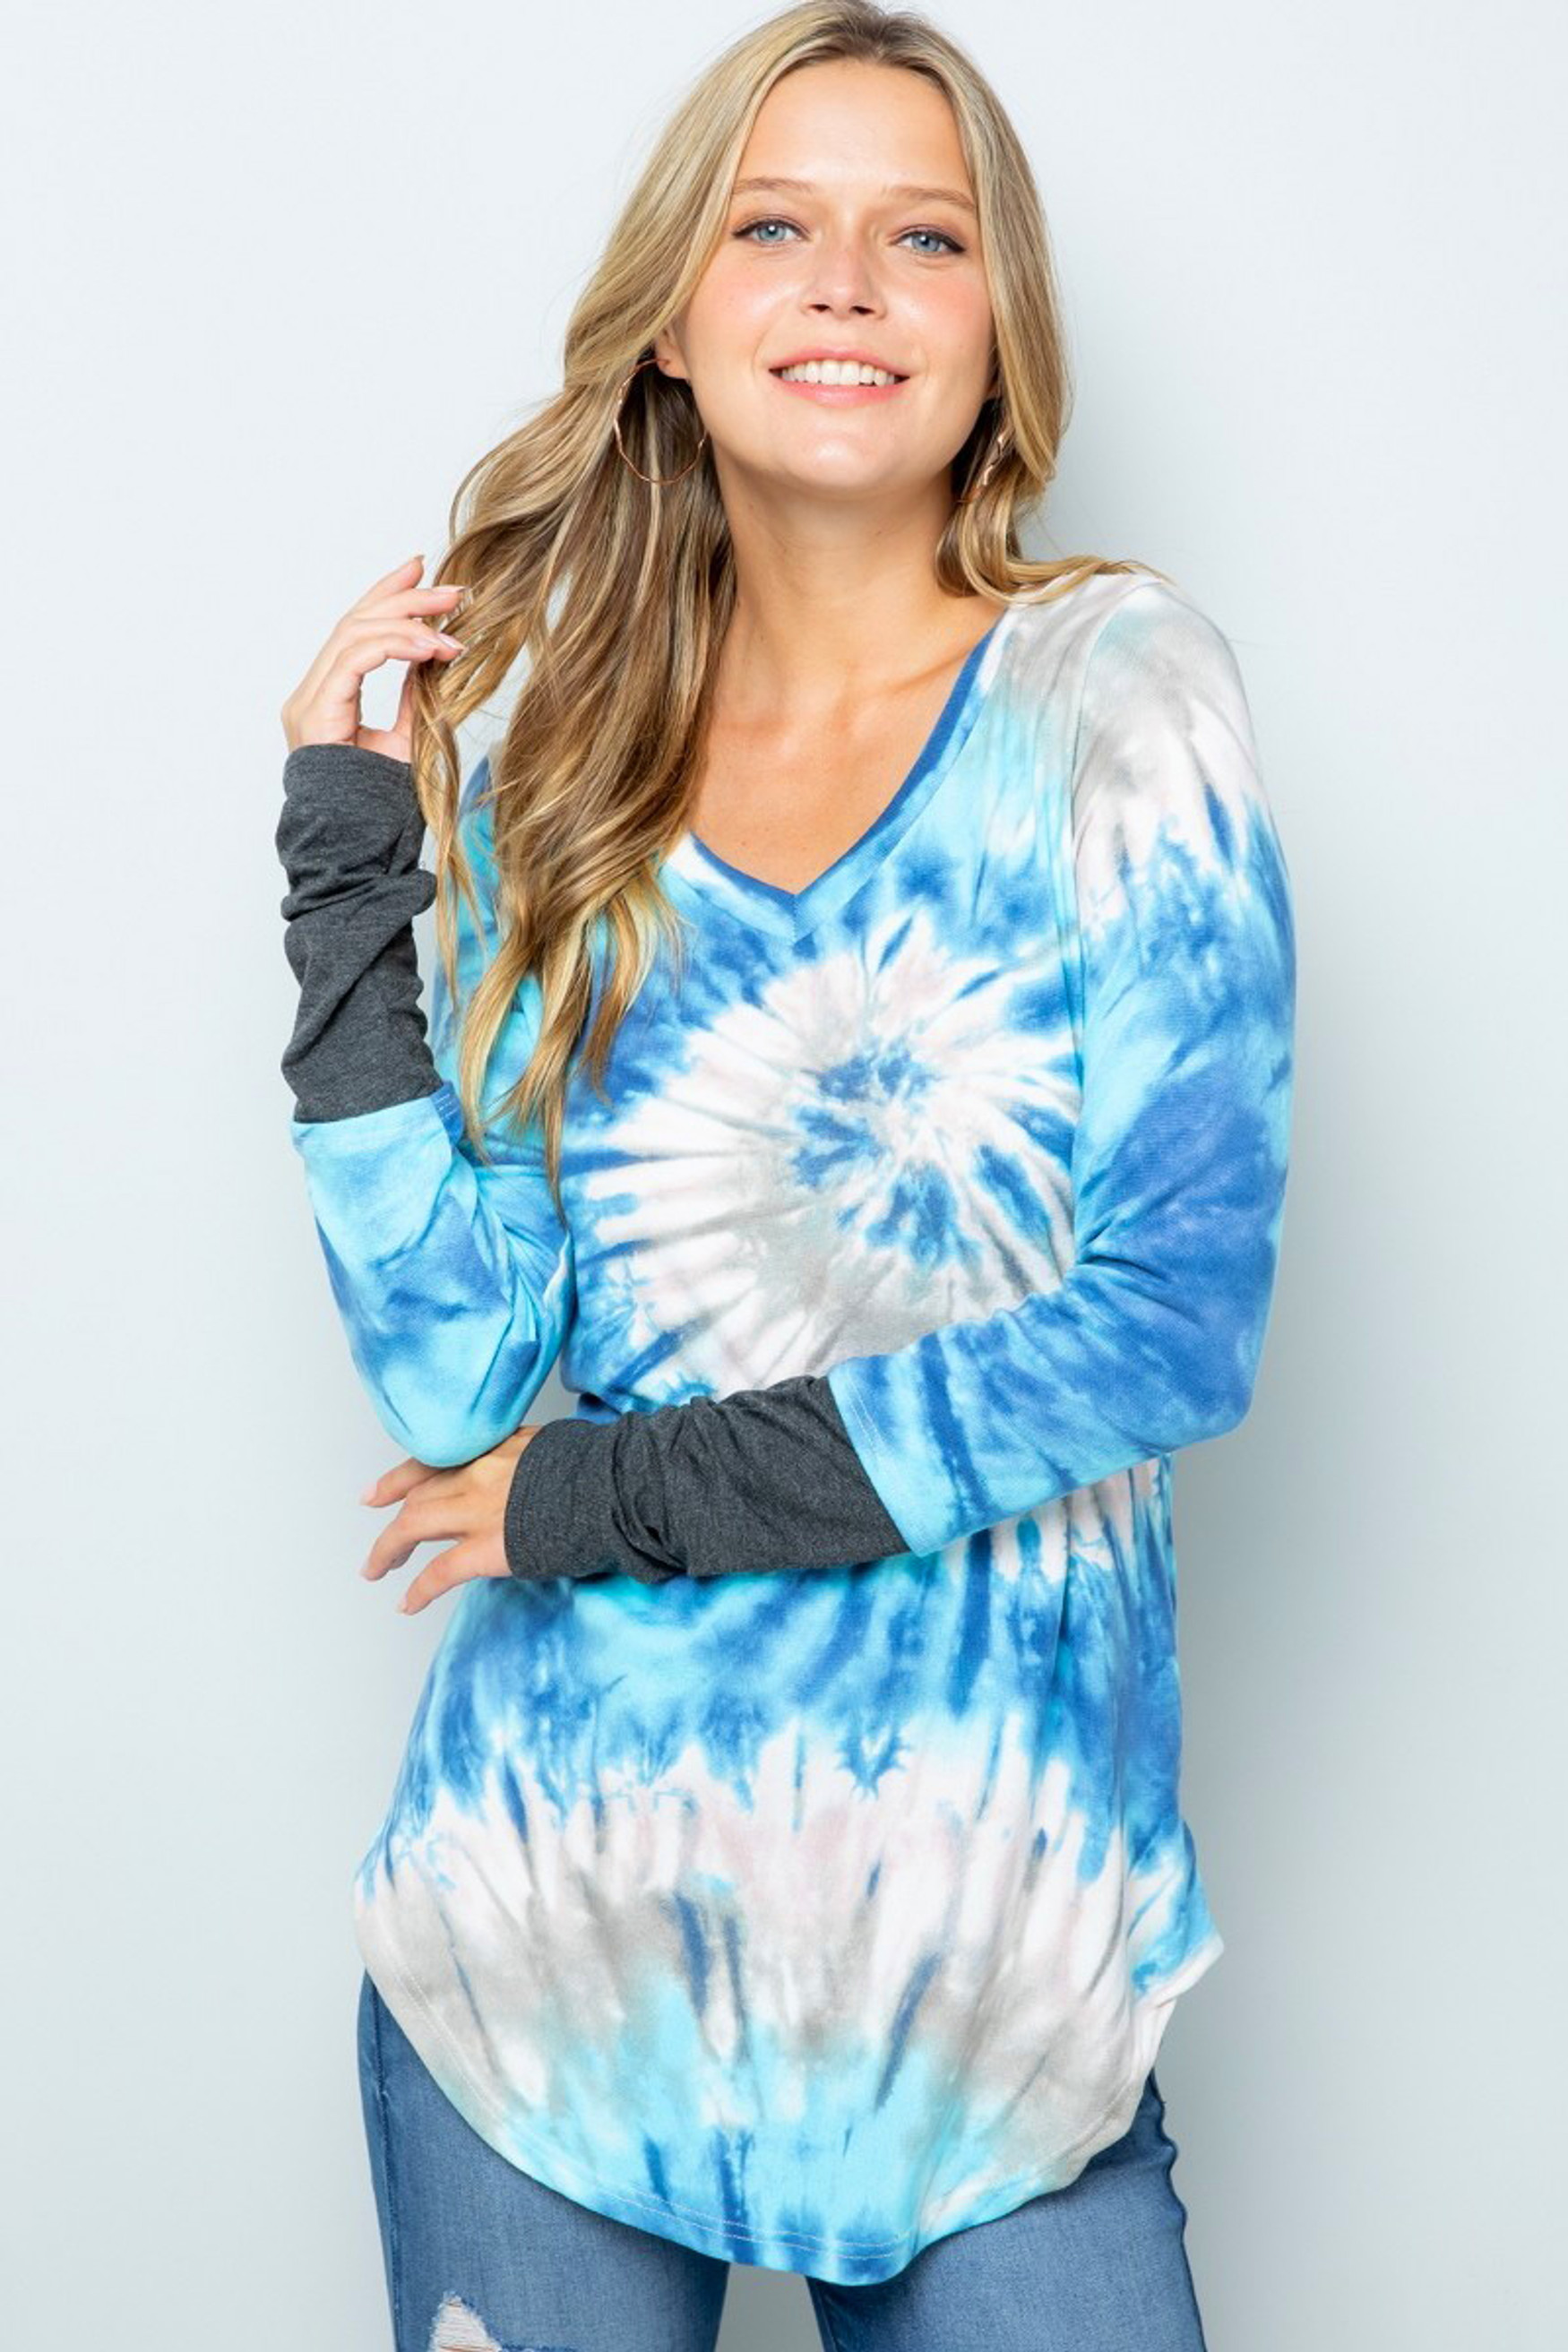 Aqua Tie Dye Contrast Cuff Long Sleeve V Neck Top